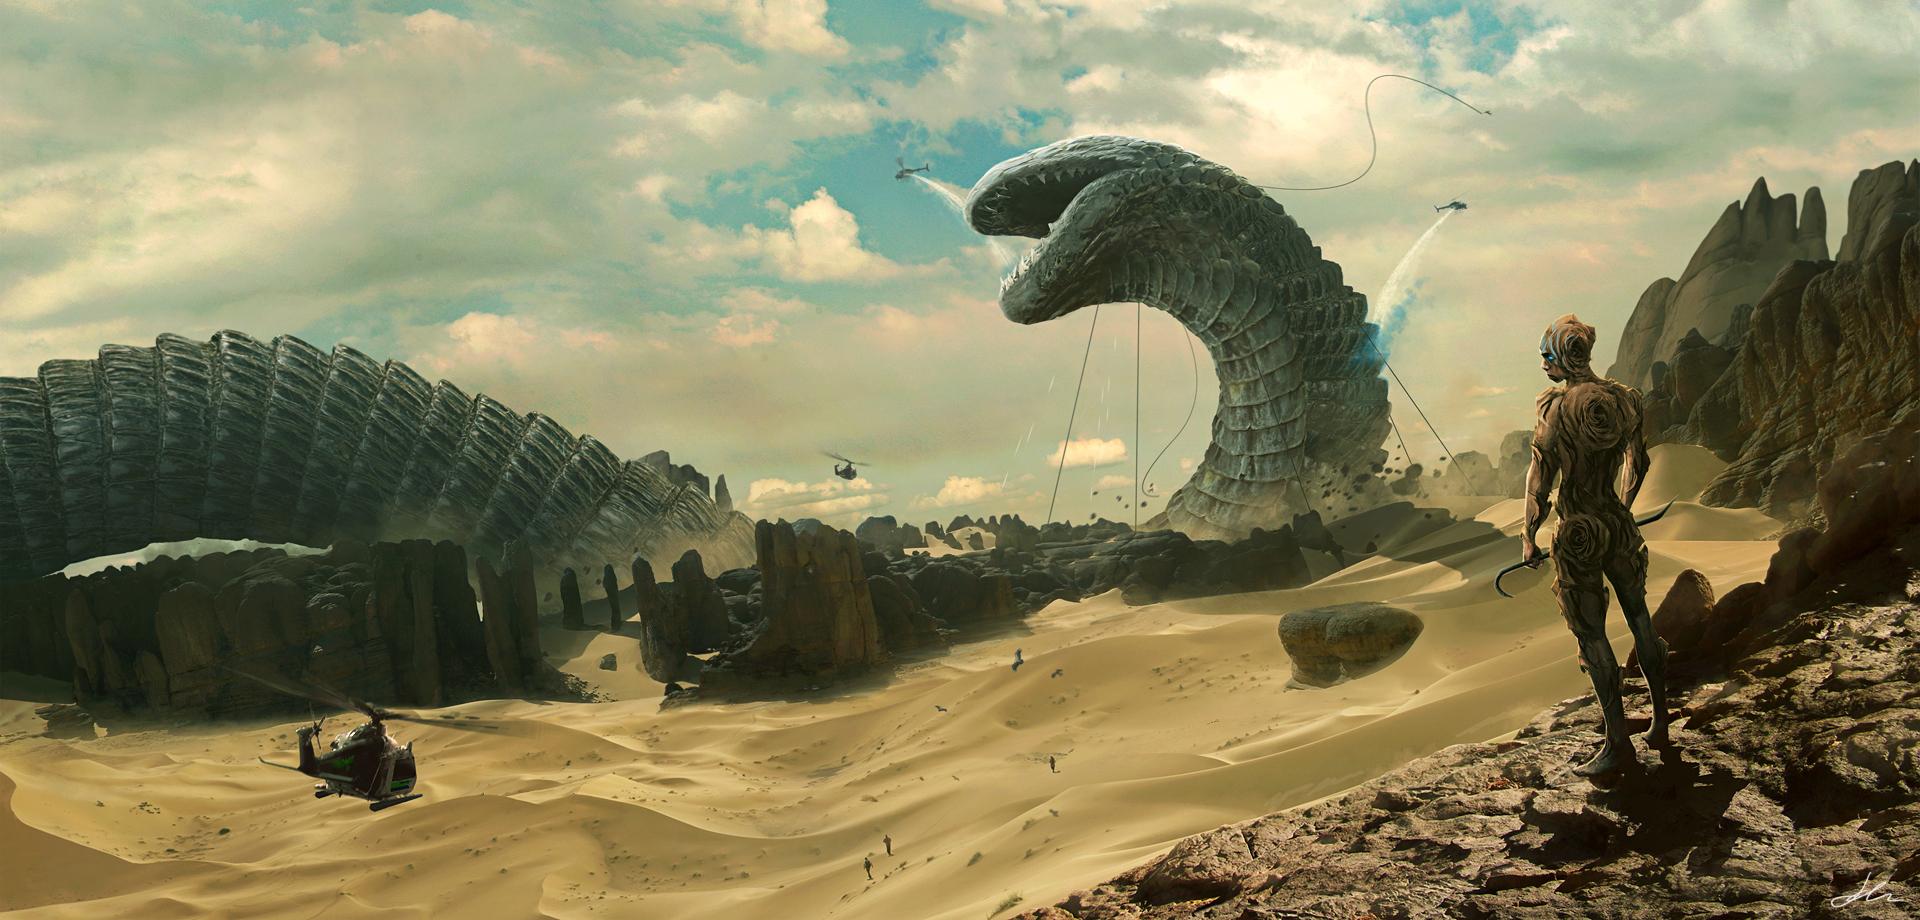 Shai-Hulud and the God Emperor by ErikShoemaker